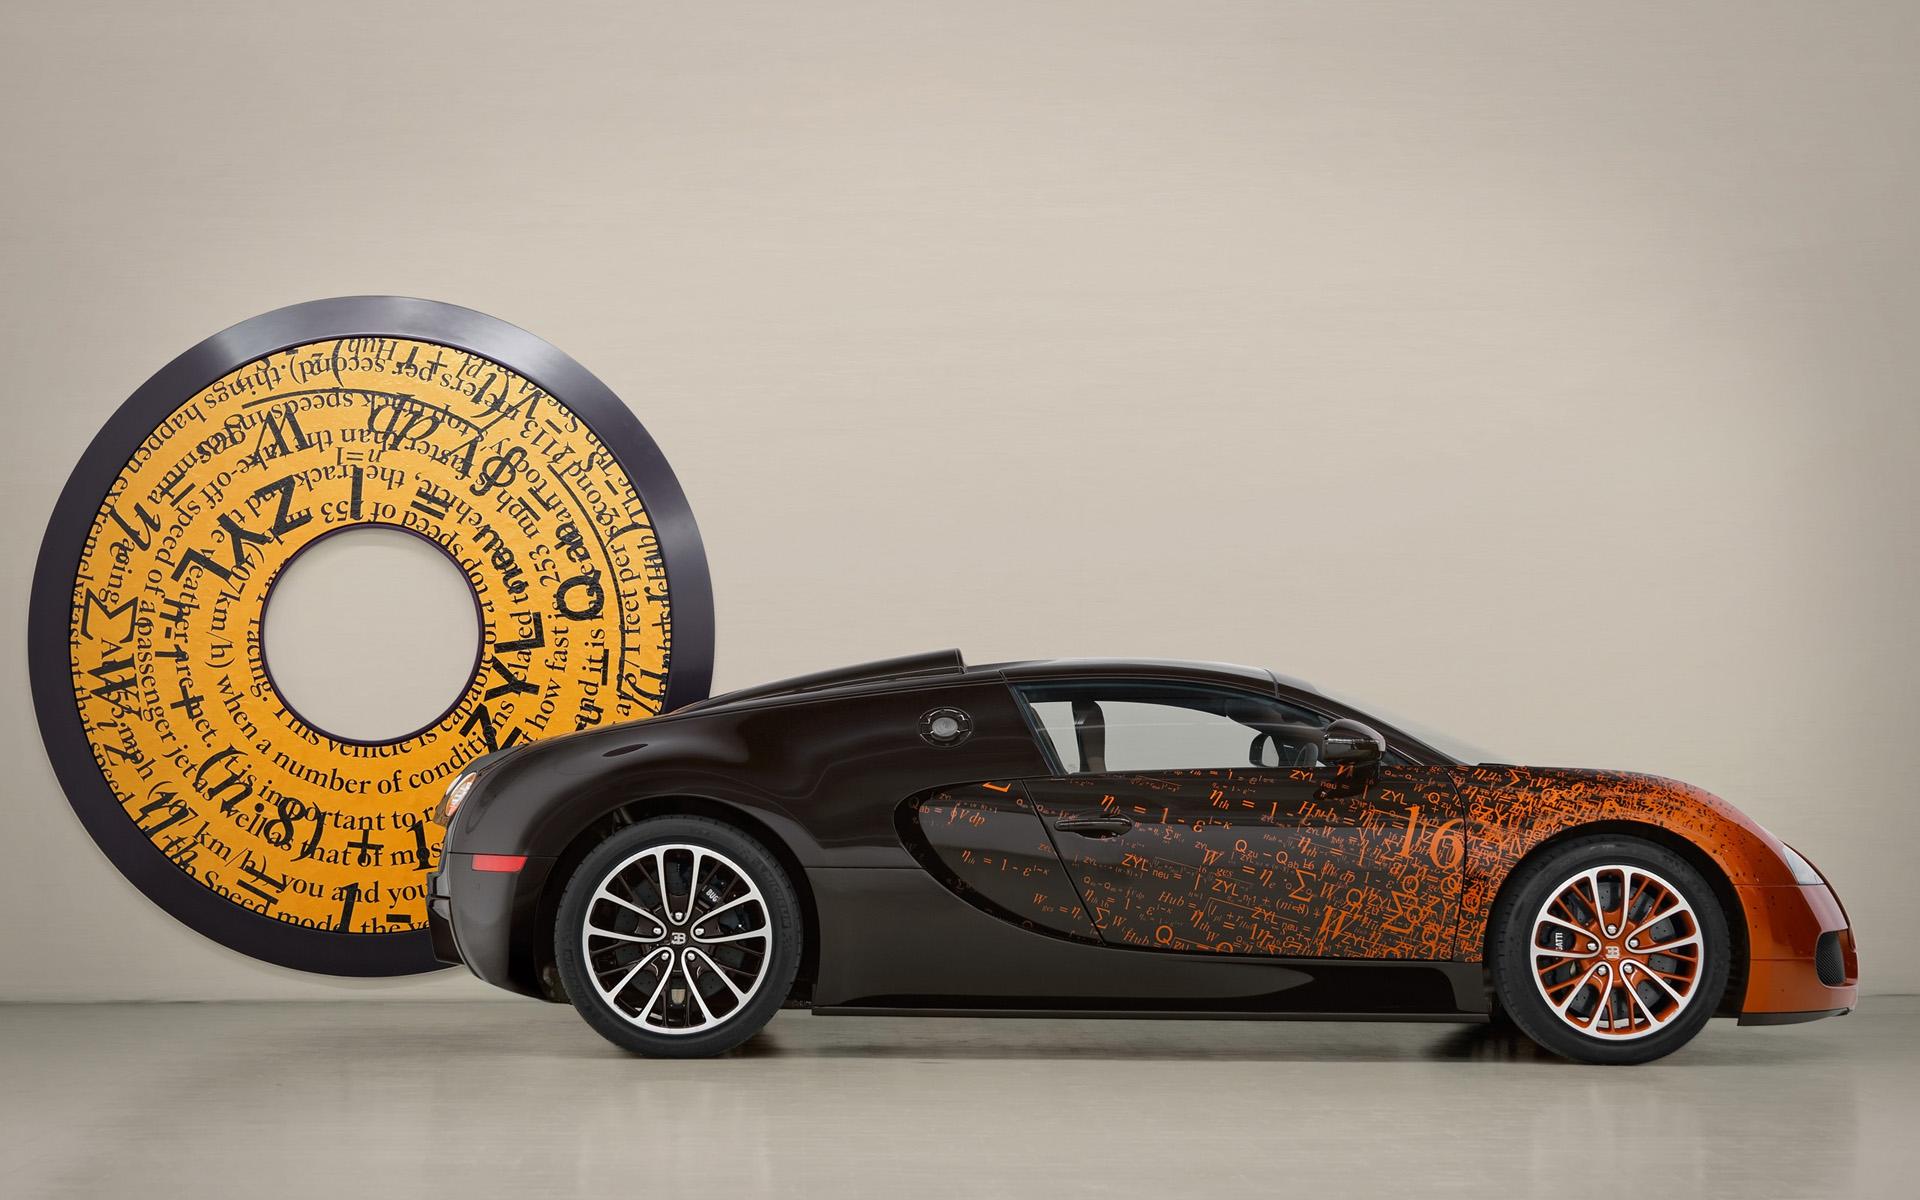 2012-Bugatti-Veyron-Grand-Sport-Venet-01 Fabulous 2012 Bugatti Veyron Grand Sport Vitesse Specs Cars Trend